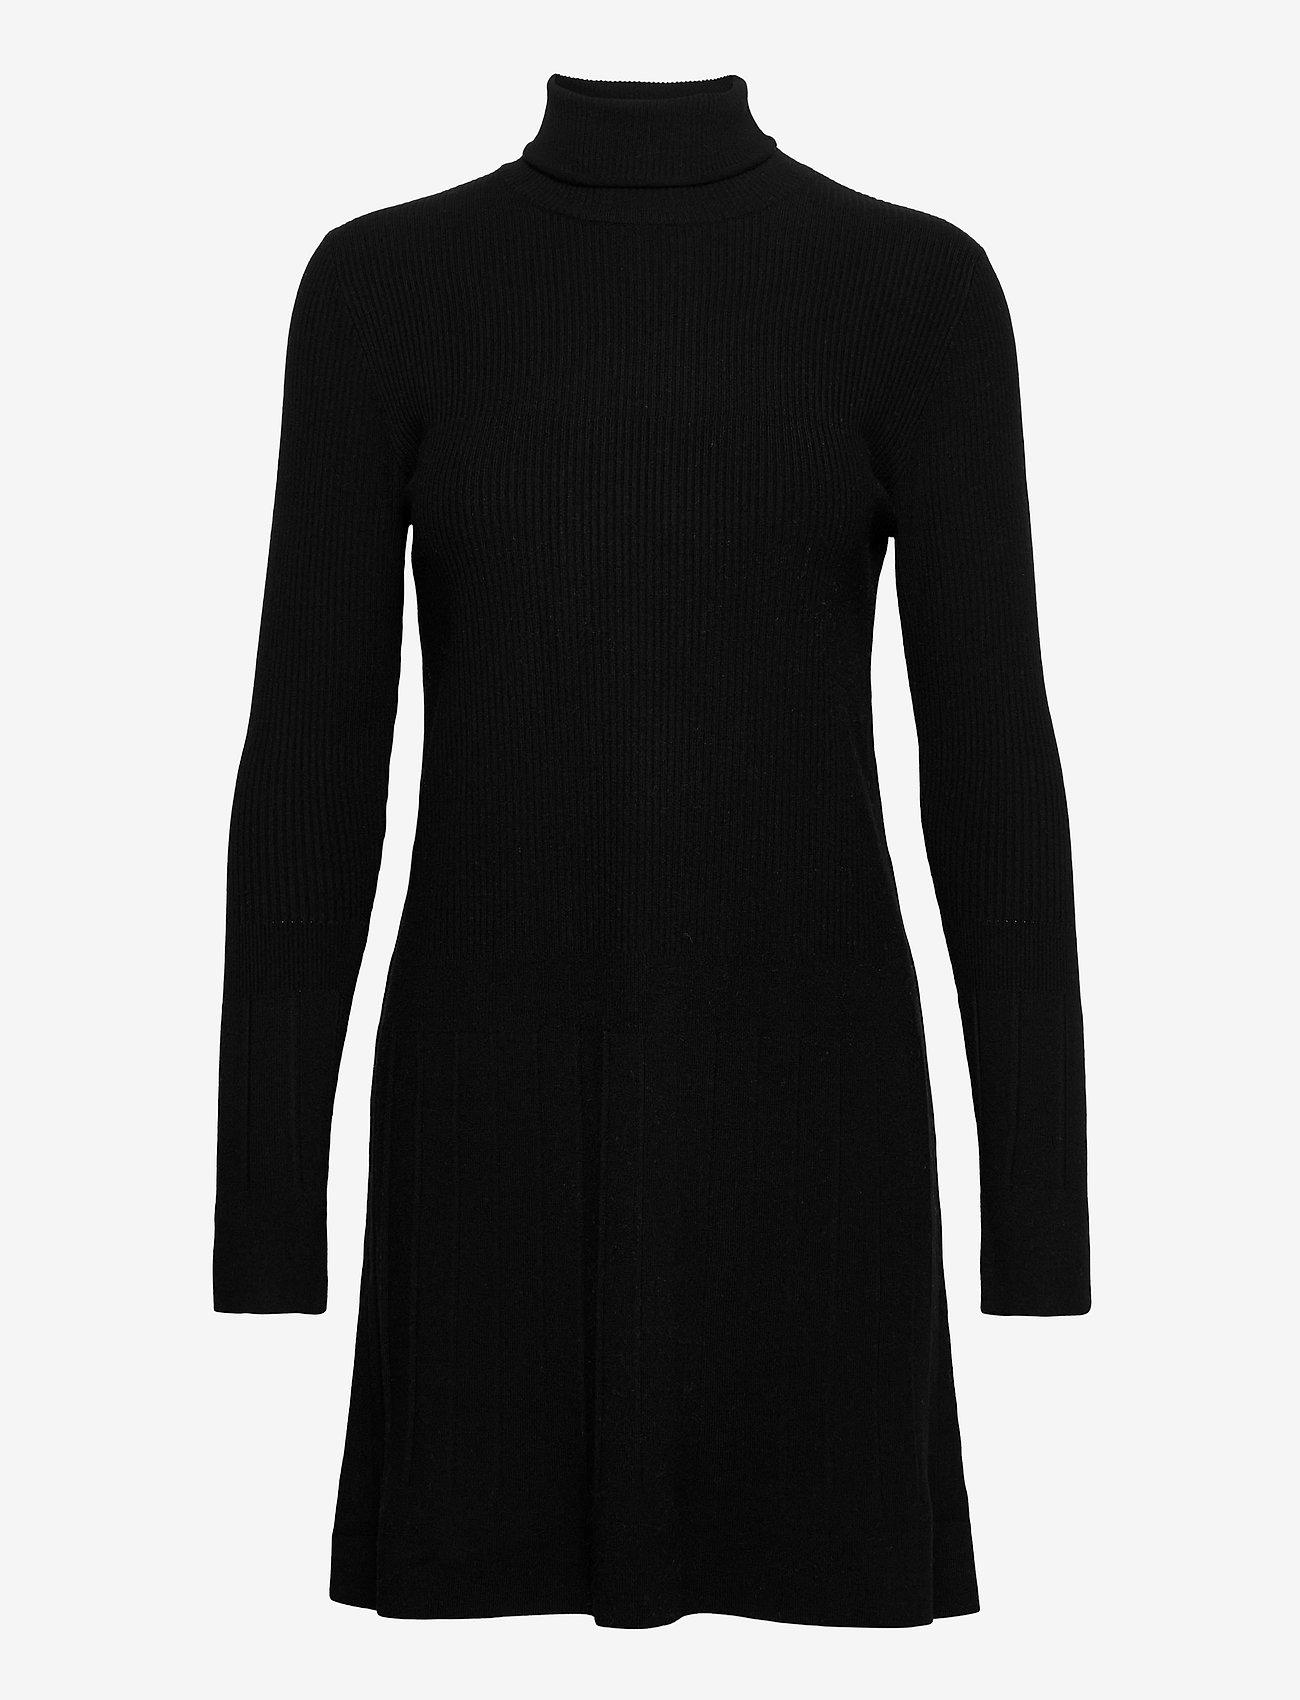 Max&Co. - CINEMA - alledaagse jurken - black - 0